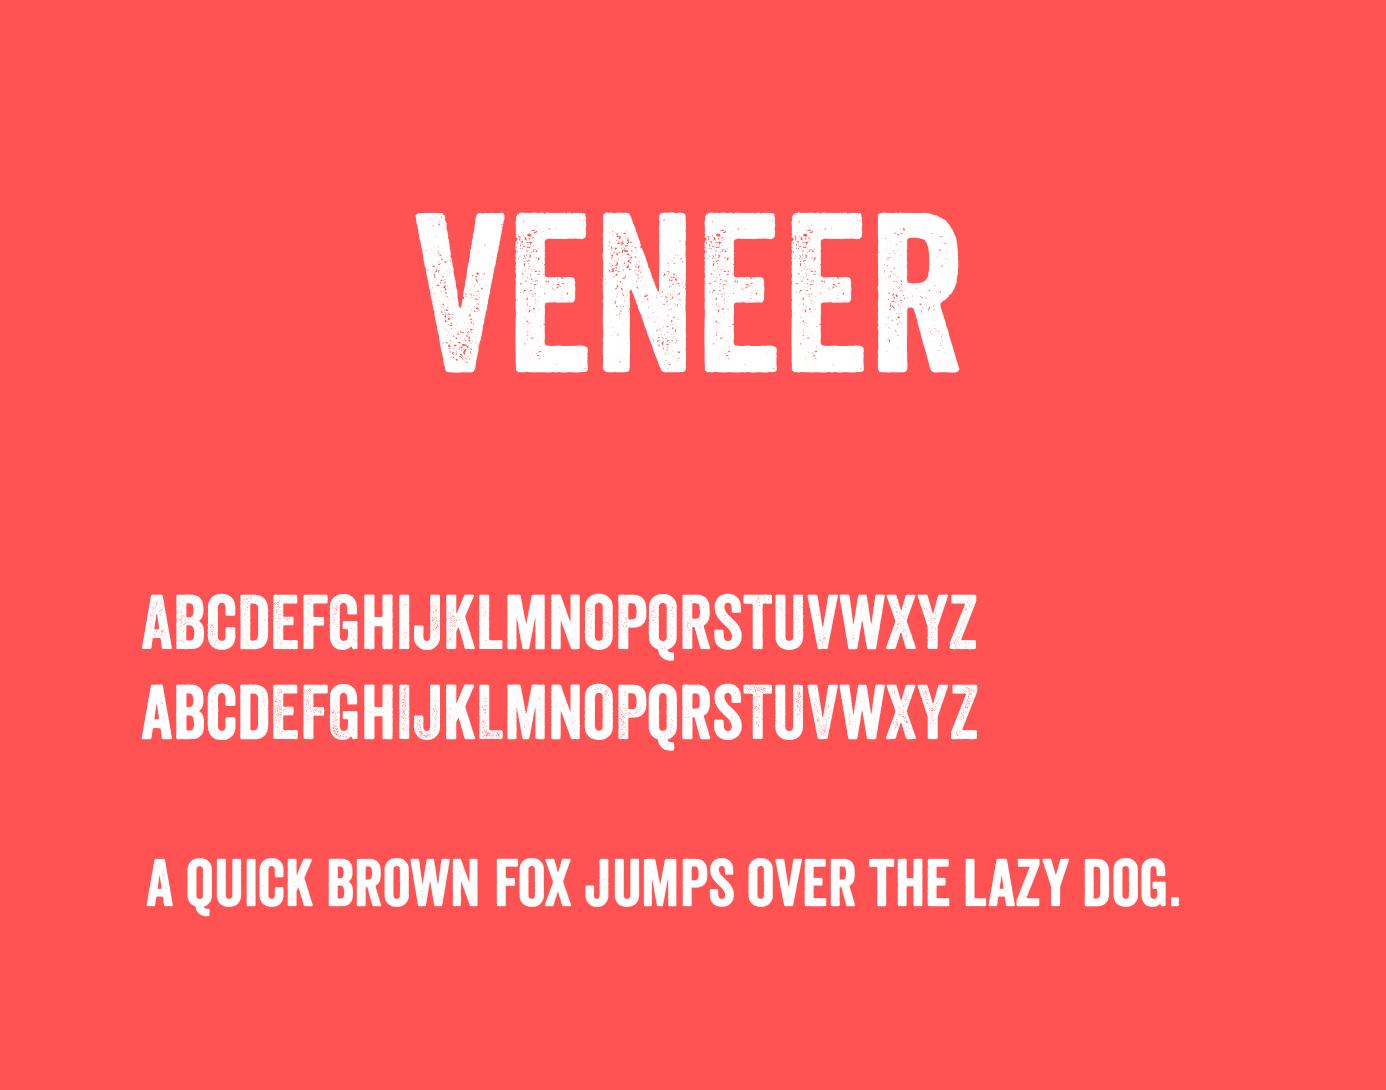 https://fontclarity.com/wp-content/uploads/2019/09/veneer-font-download-0.png Free Download